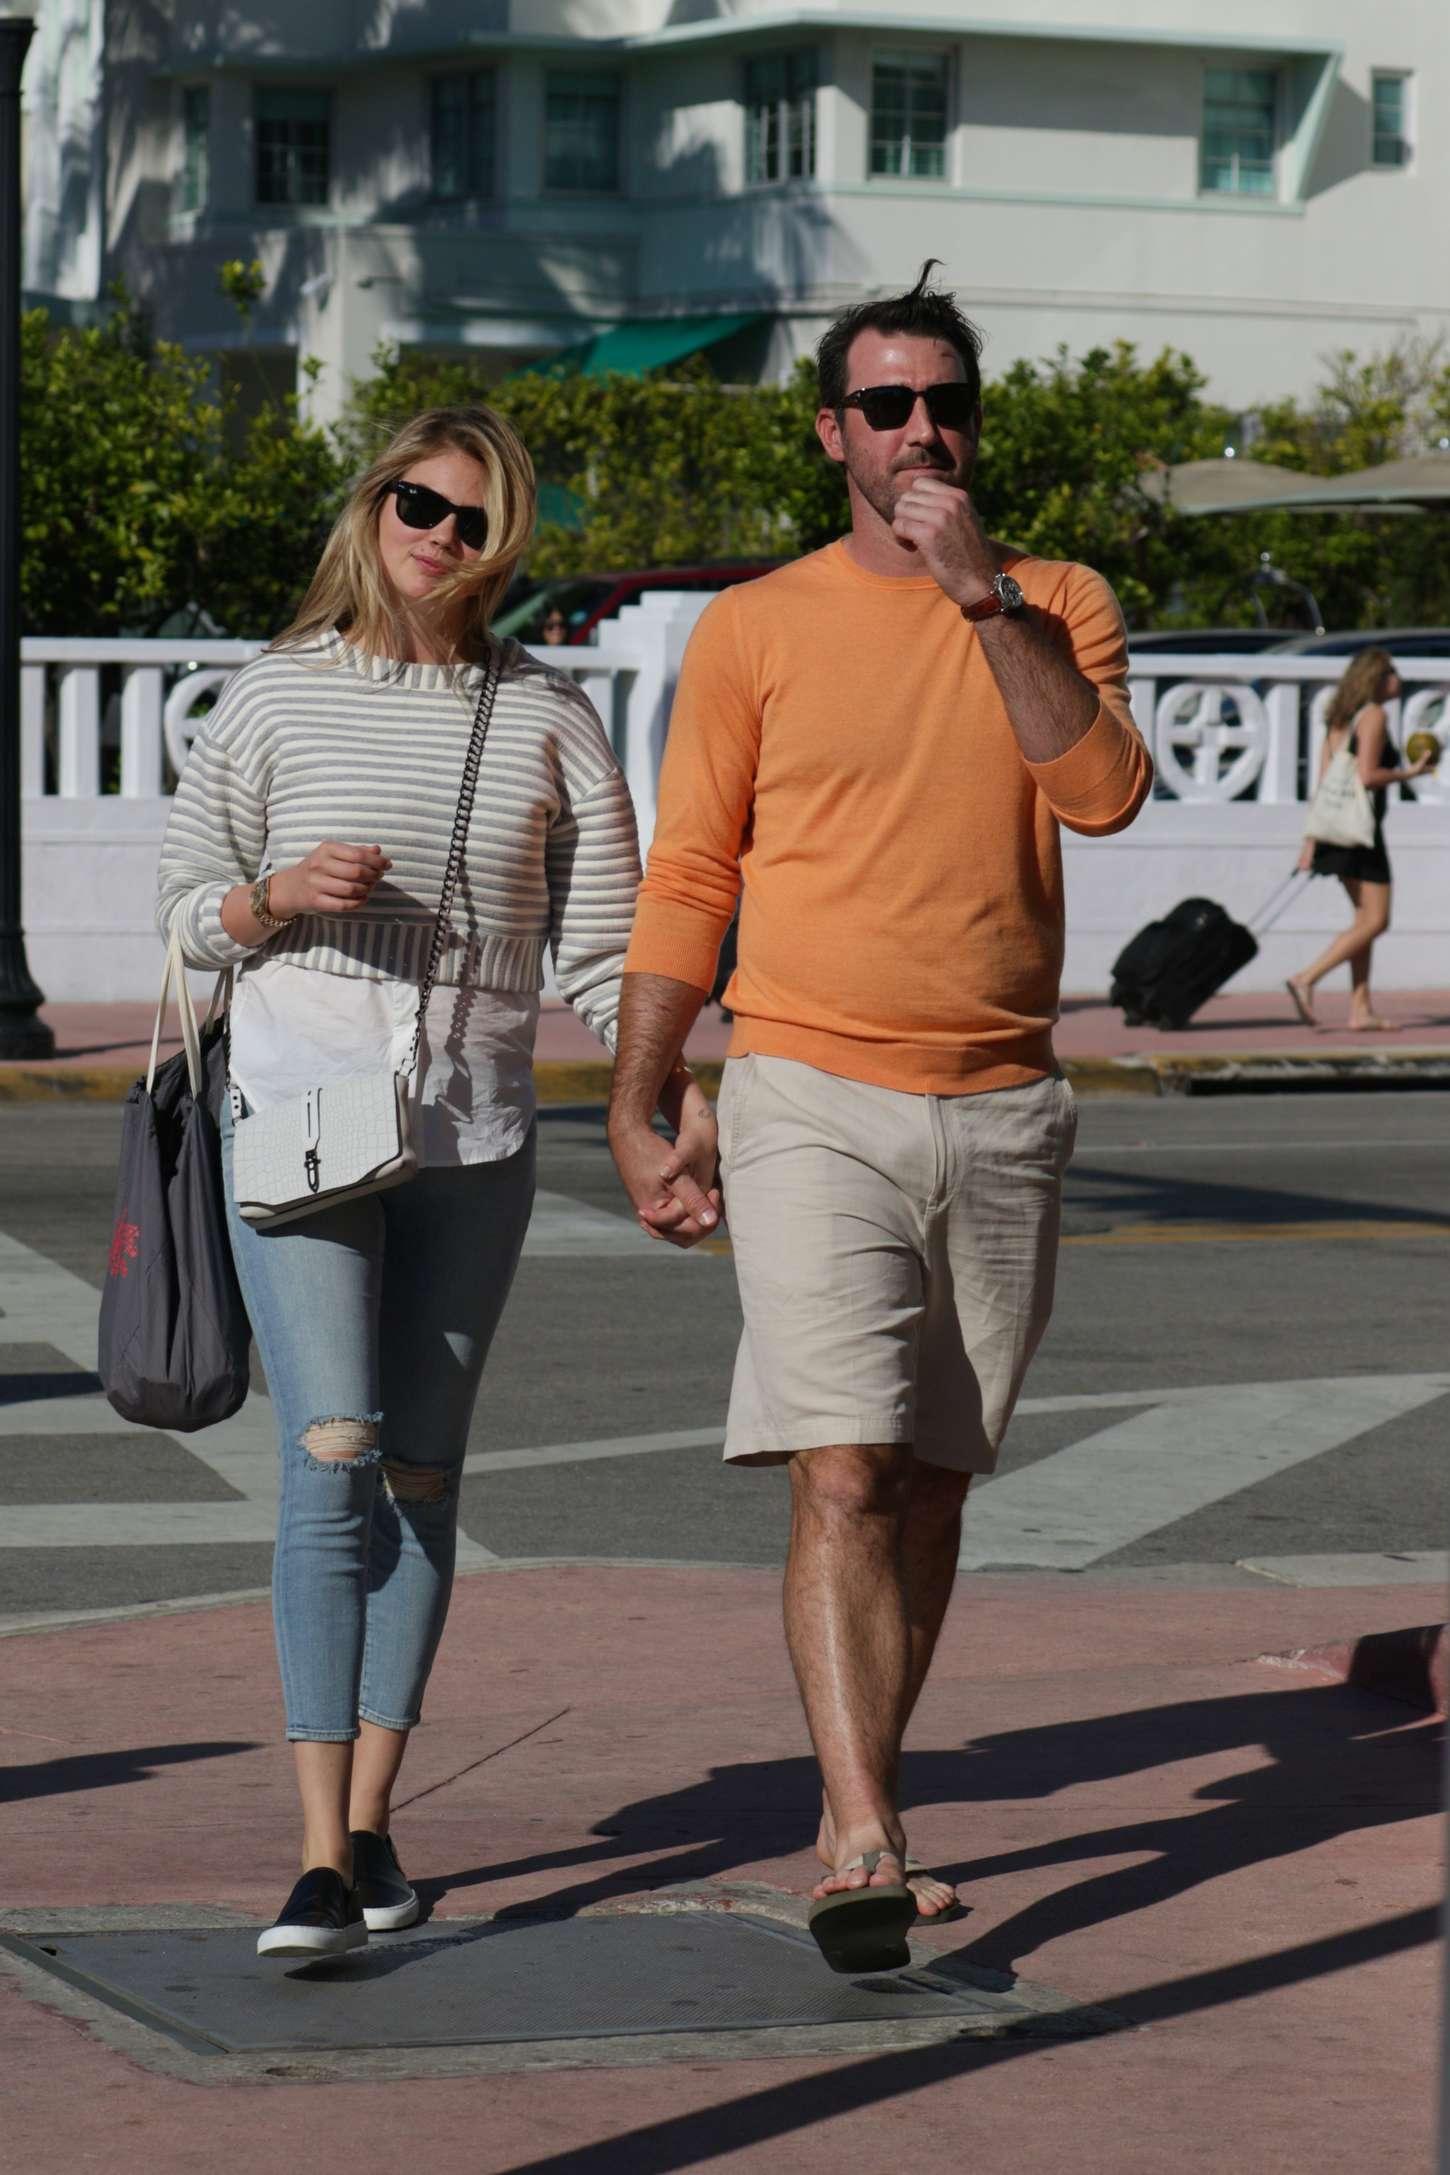 Kate Upton & Justin Verlander Out in Miami